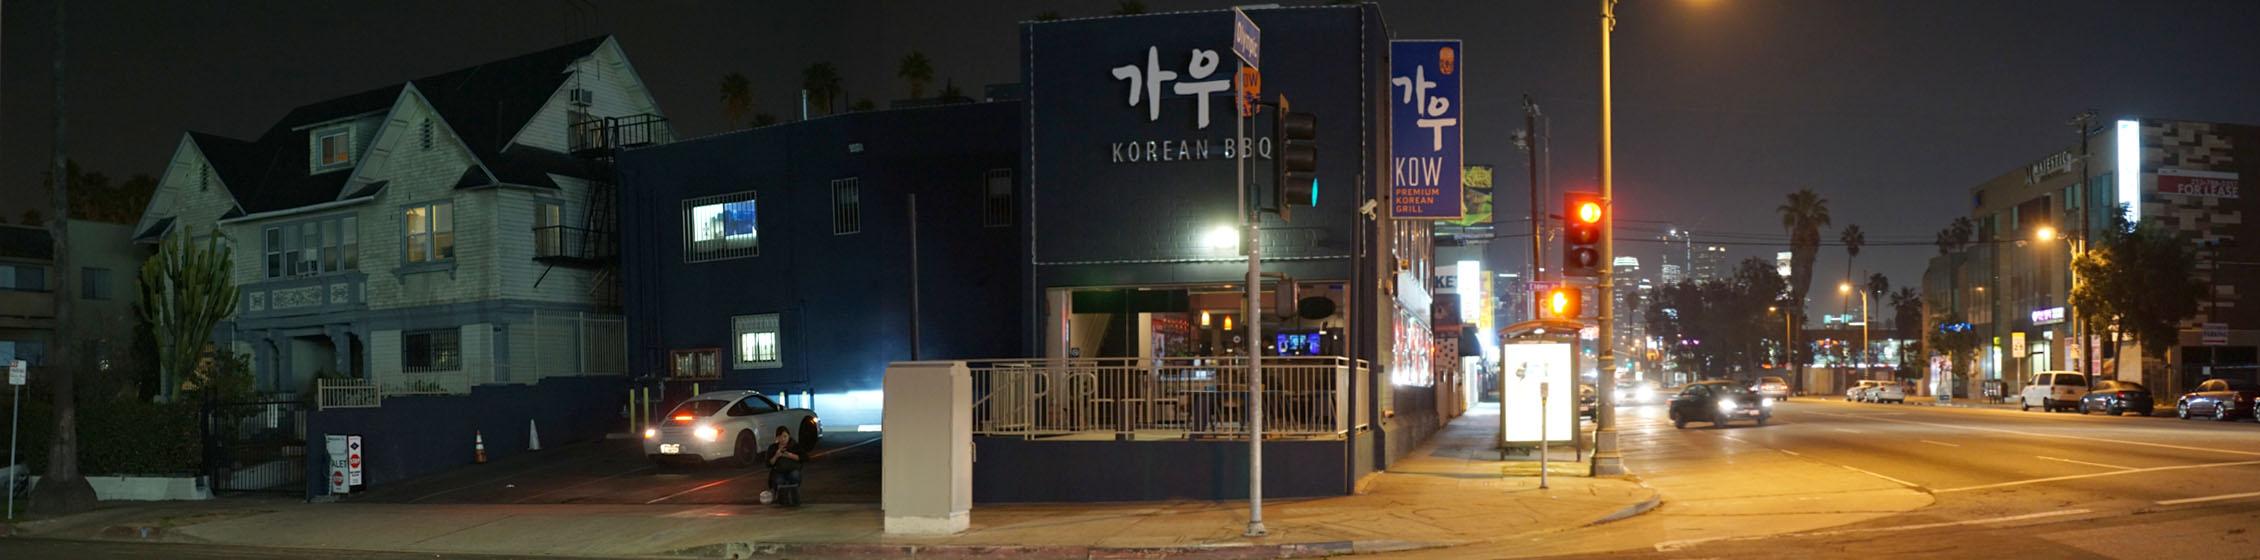 KOW Korean BBQ Exterior